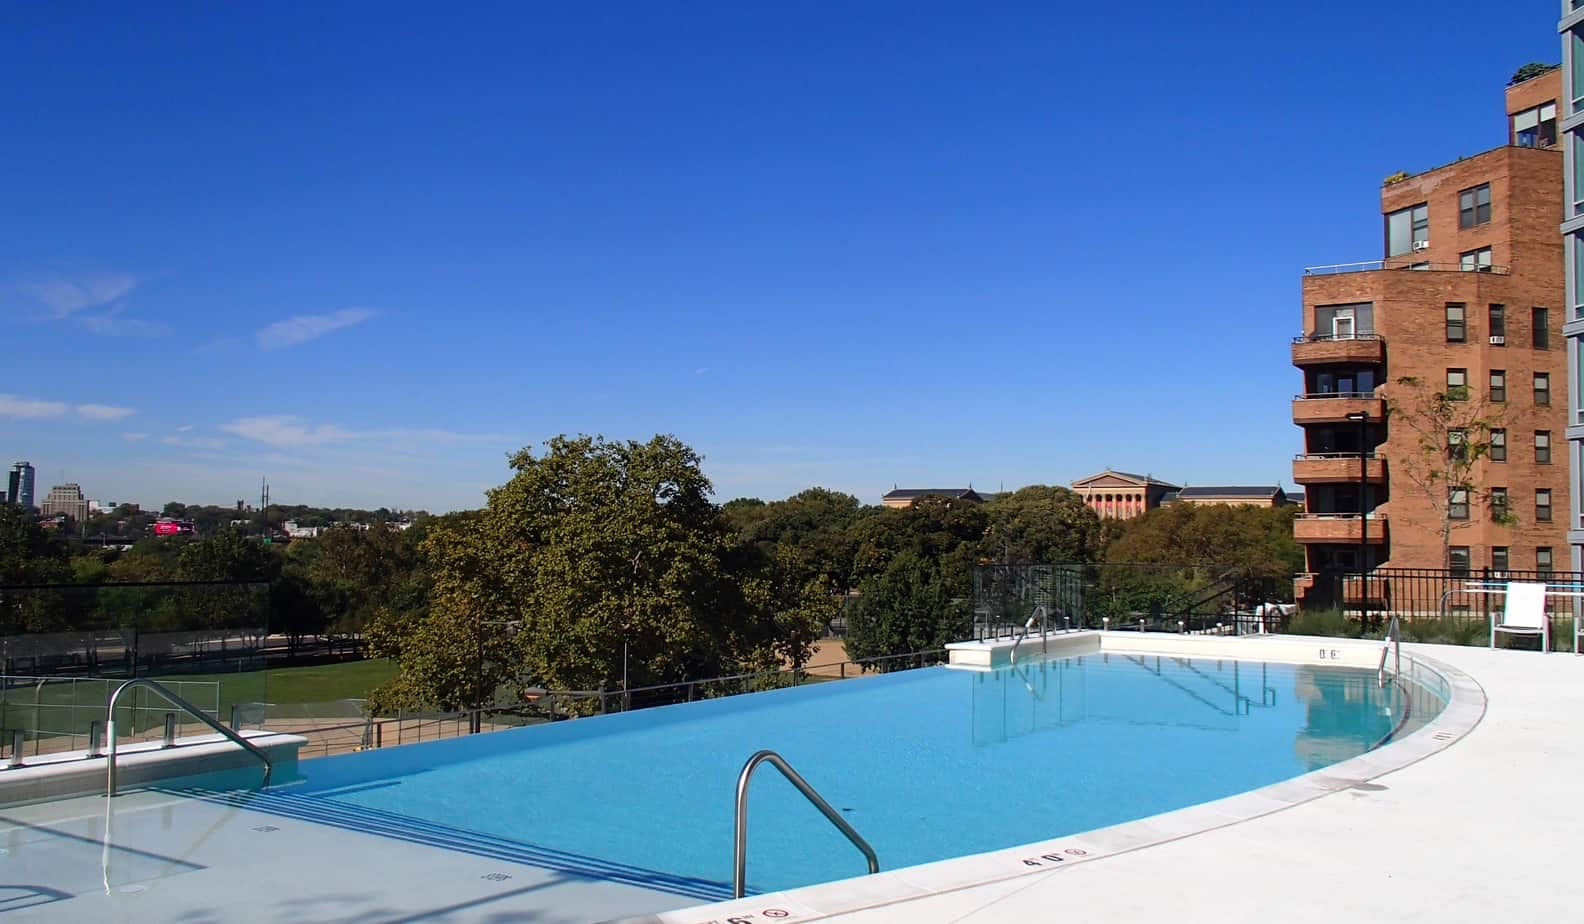 James Sankey & Associates (Sankey Pools) - Dalian on the Park